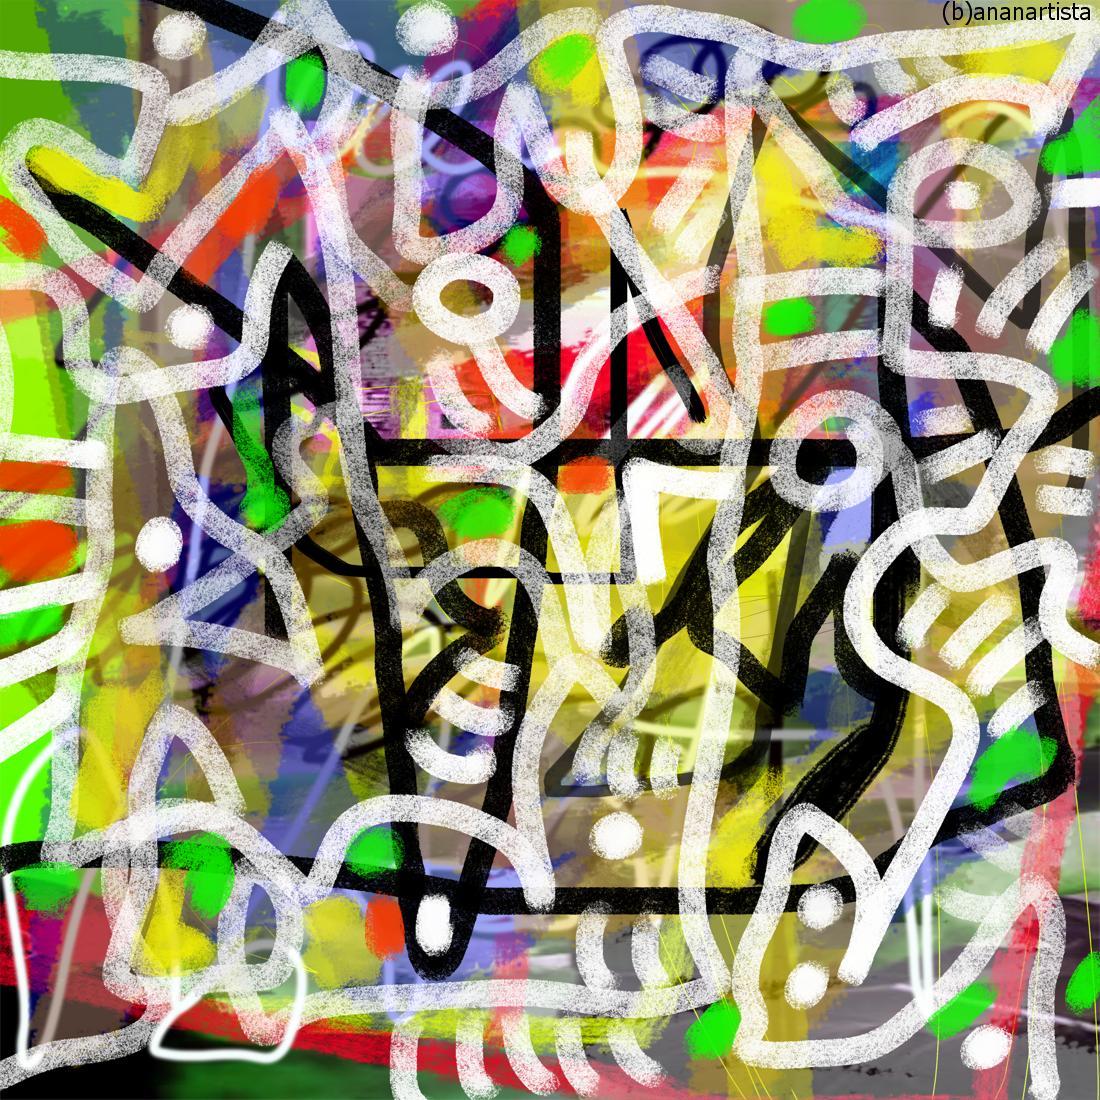 50 giga: digital painting by (b)ananartista sbuff